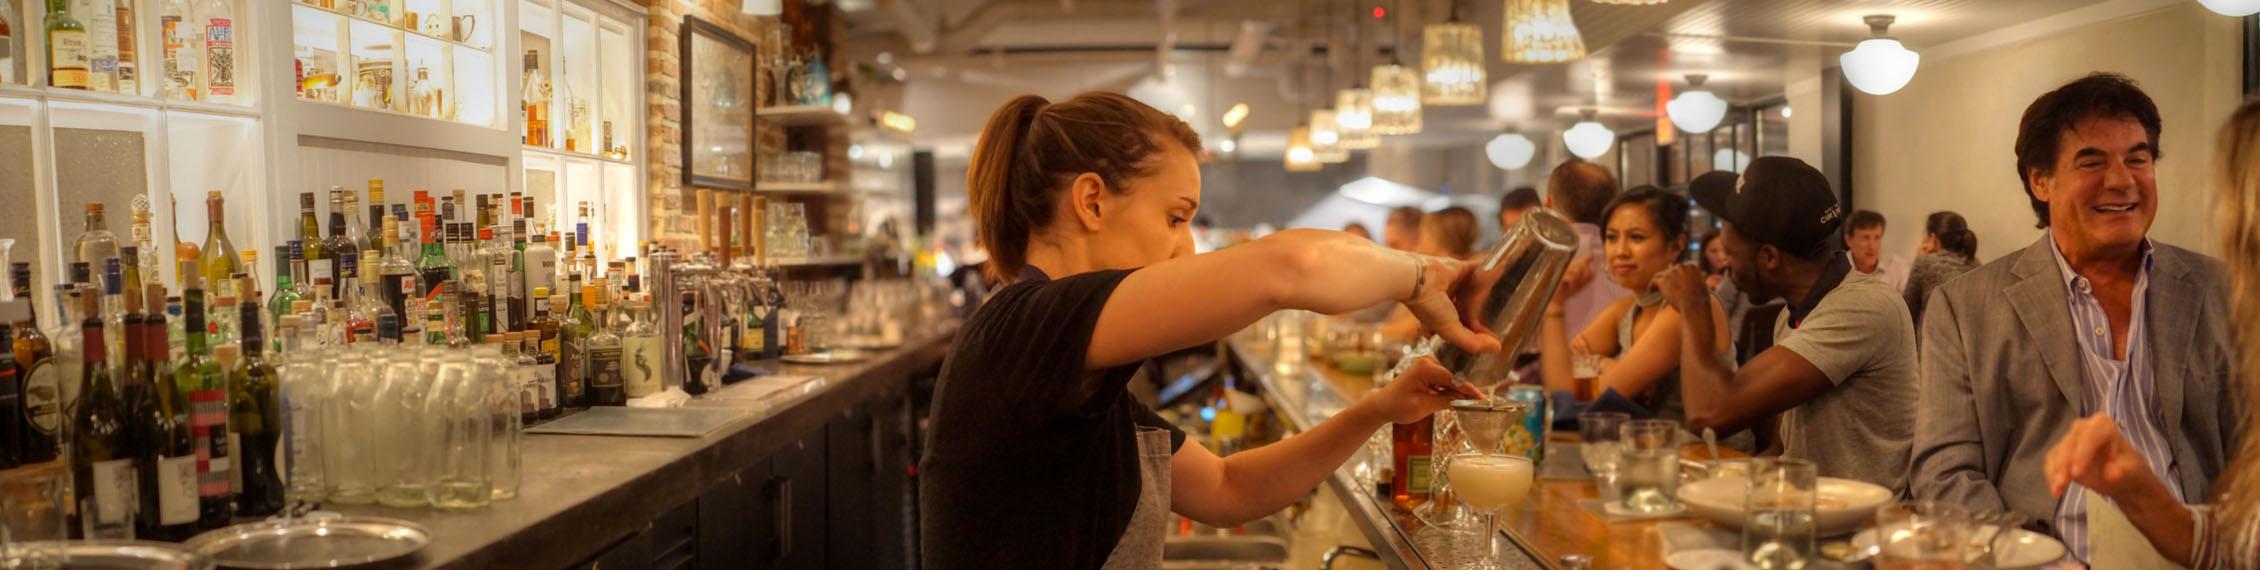 The Dabney Bar